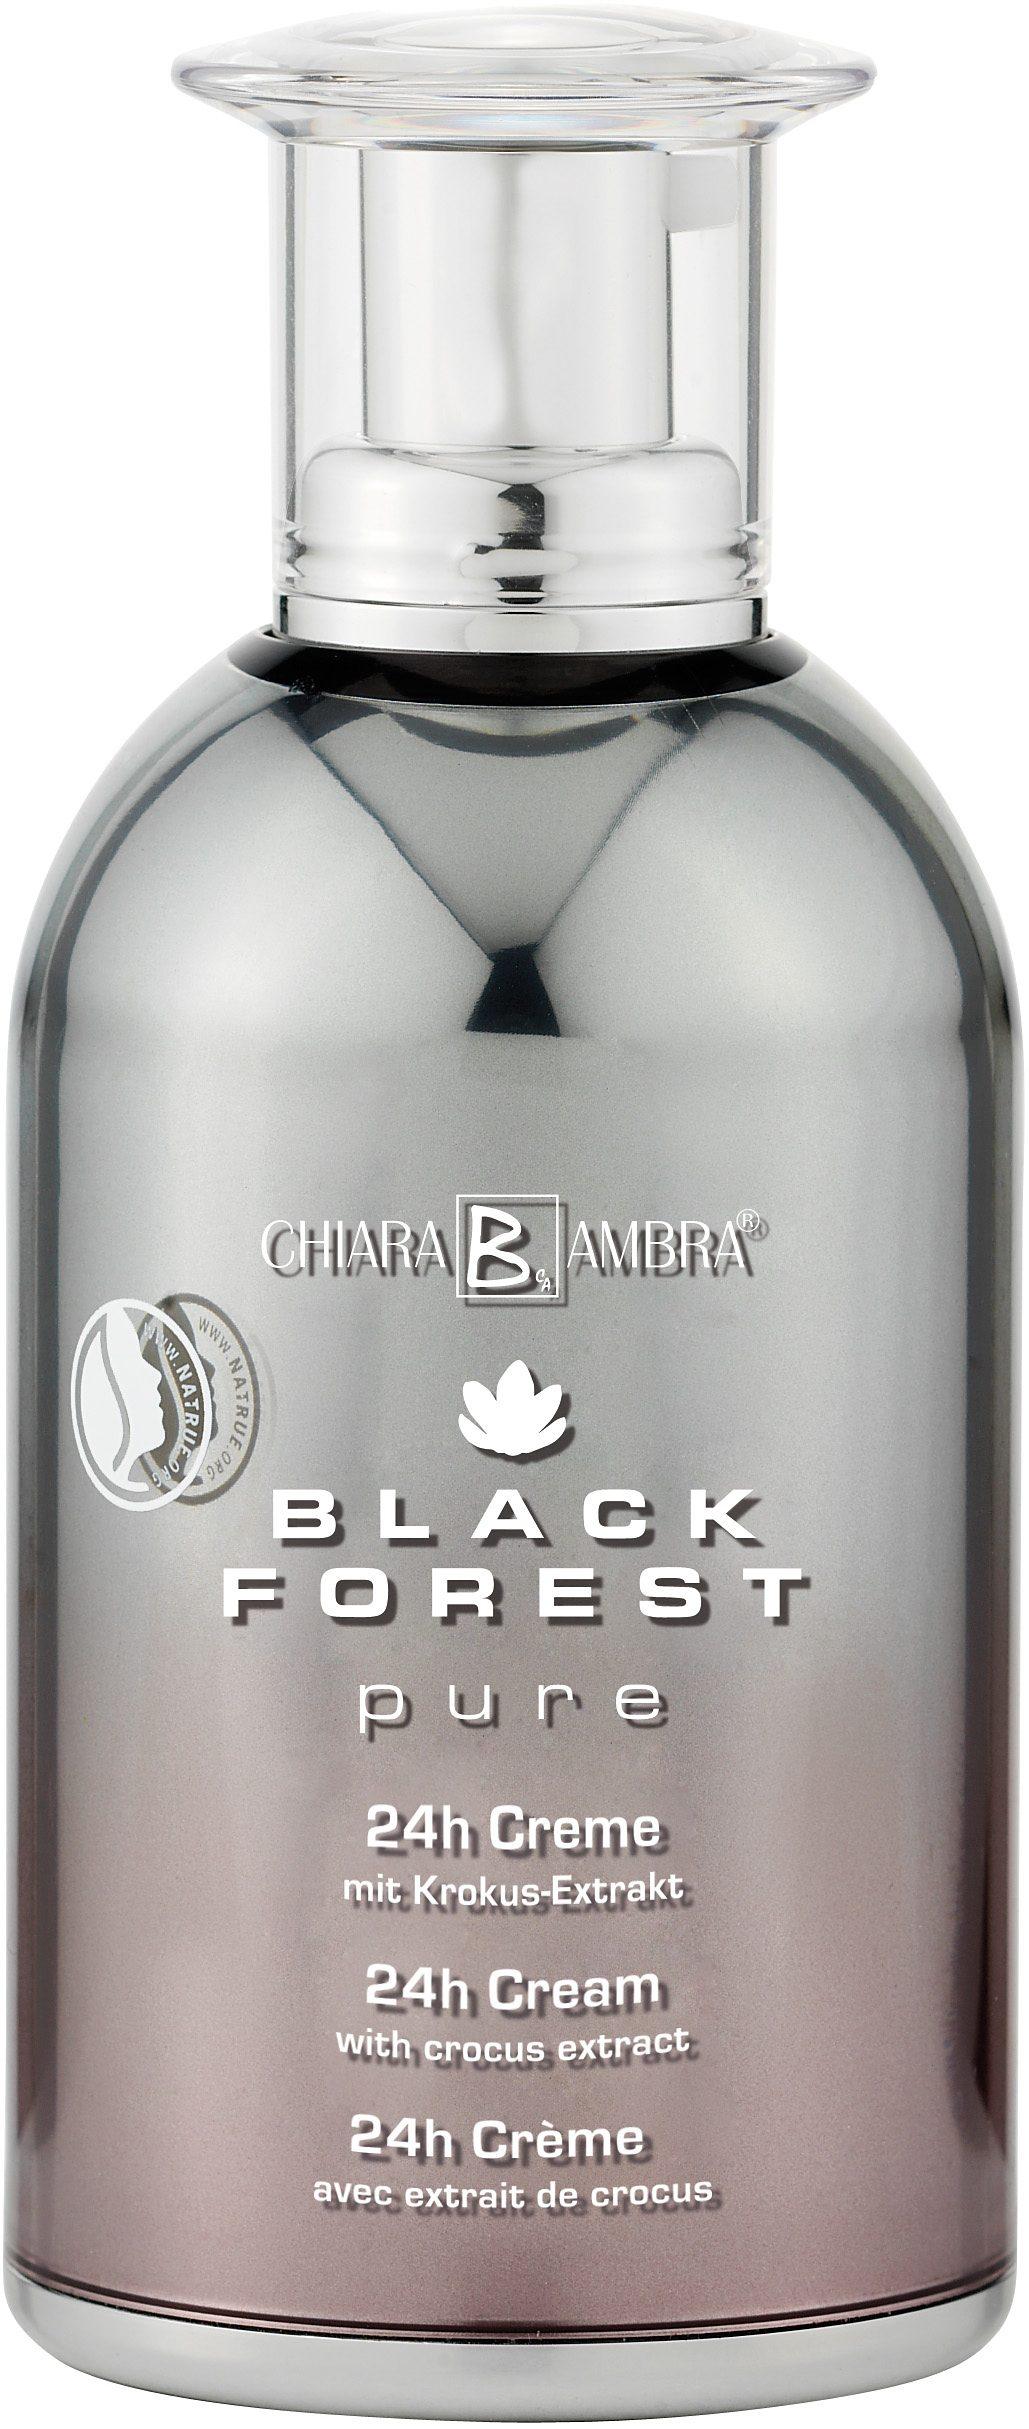 Chiara Ambra®, »Black Forest Pure«, vegane 24h Anti-Aging Creme